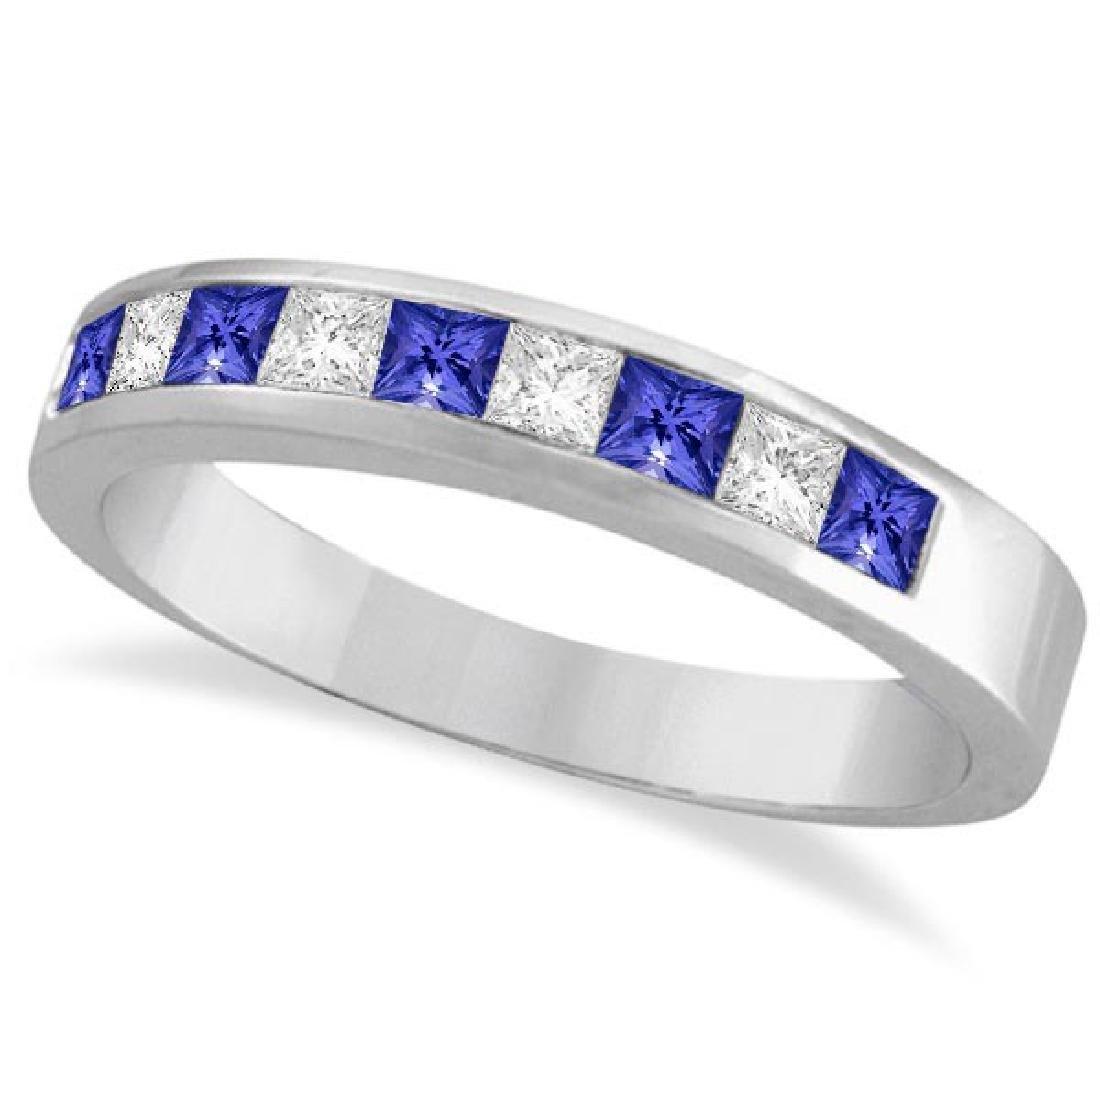 Princess-Cut Tanzanite and White Diamond Ring 14k White